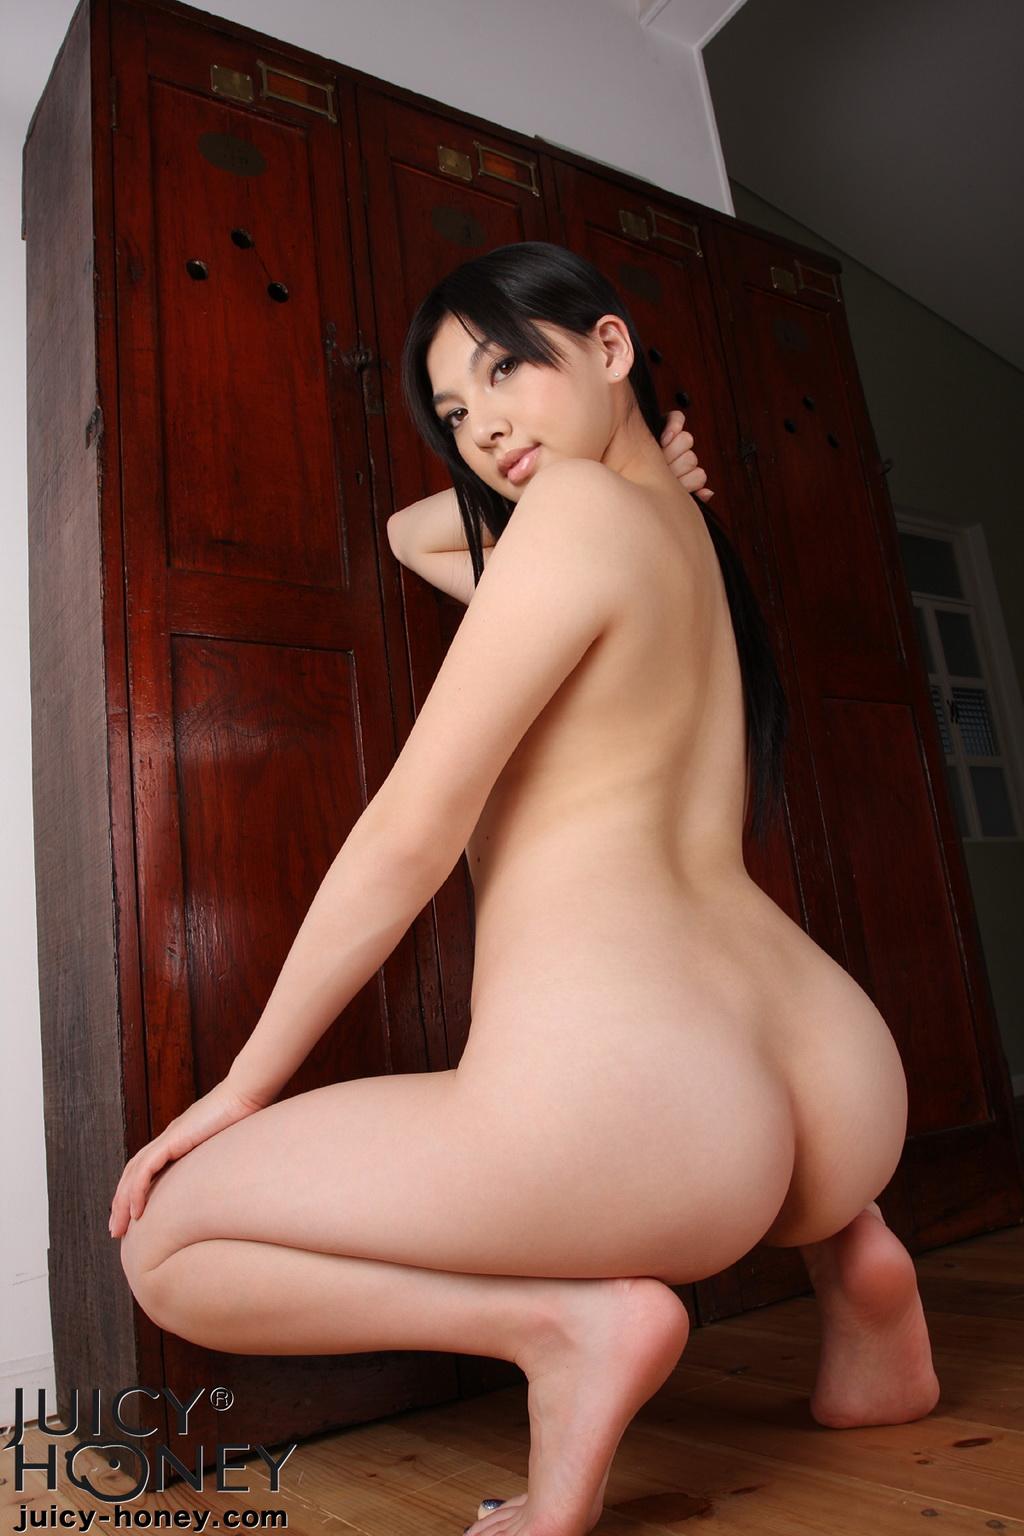 saori naked